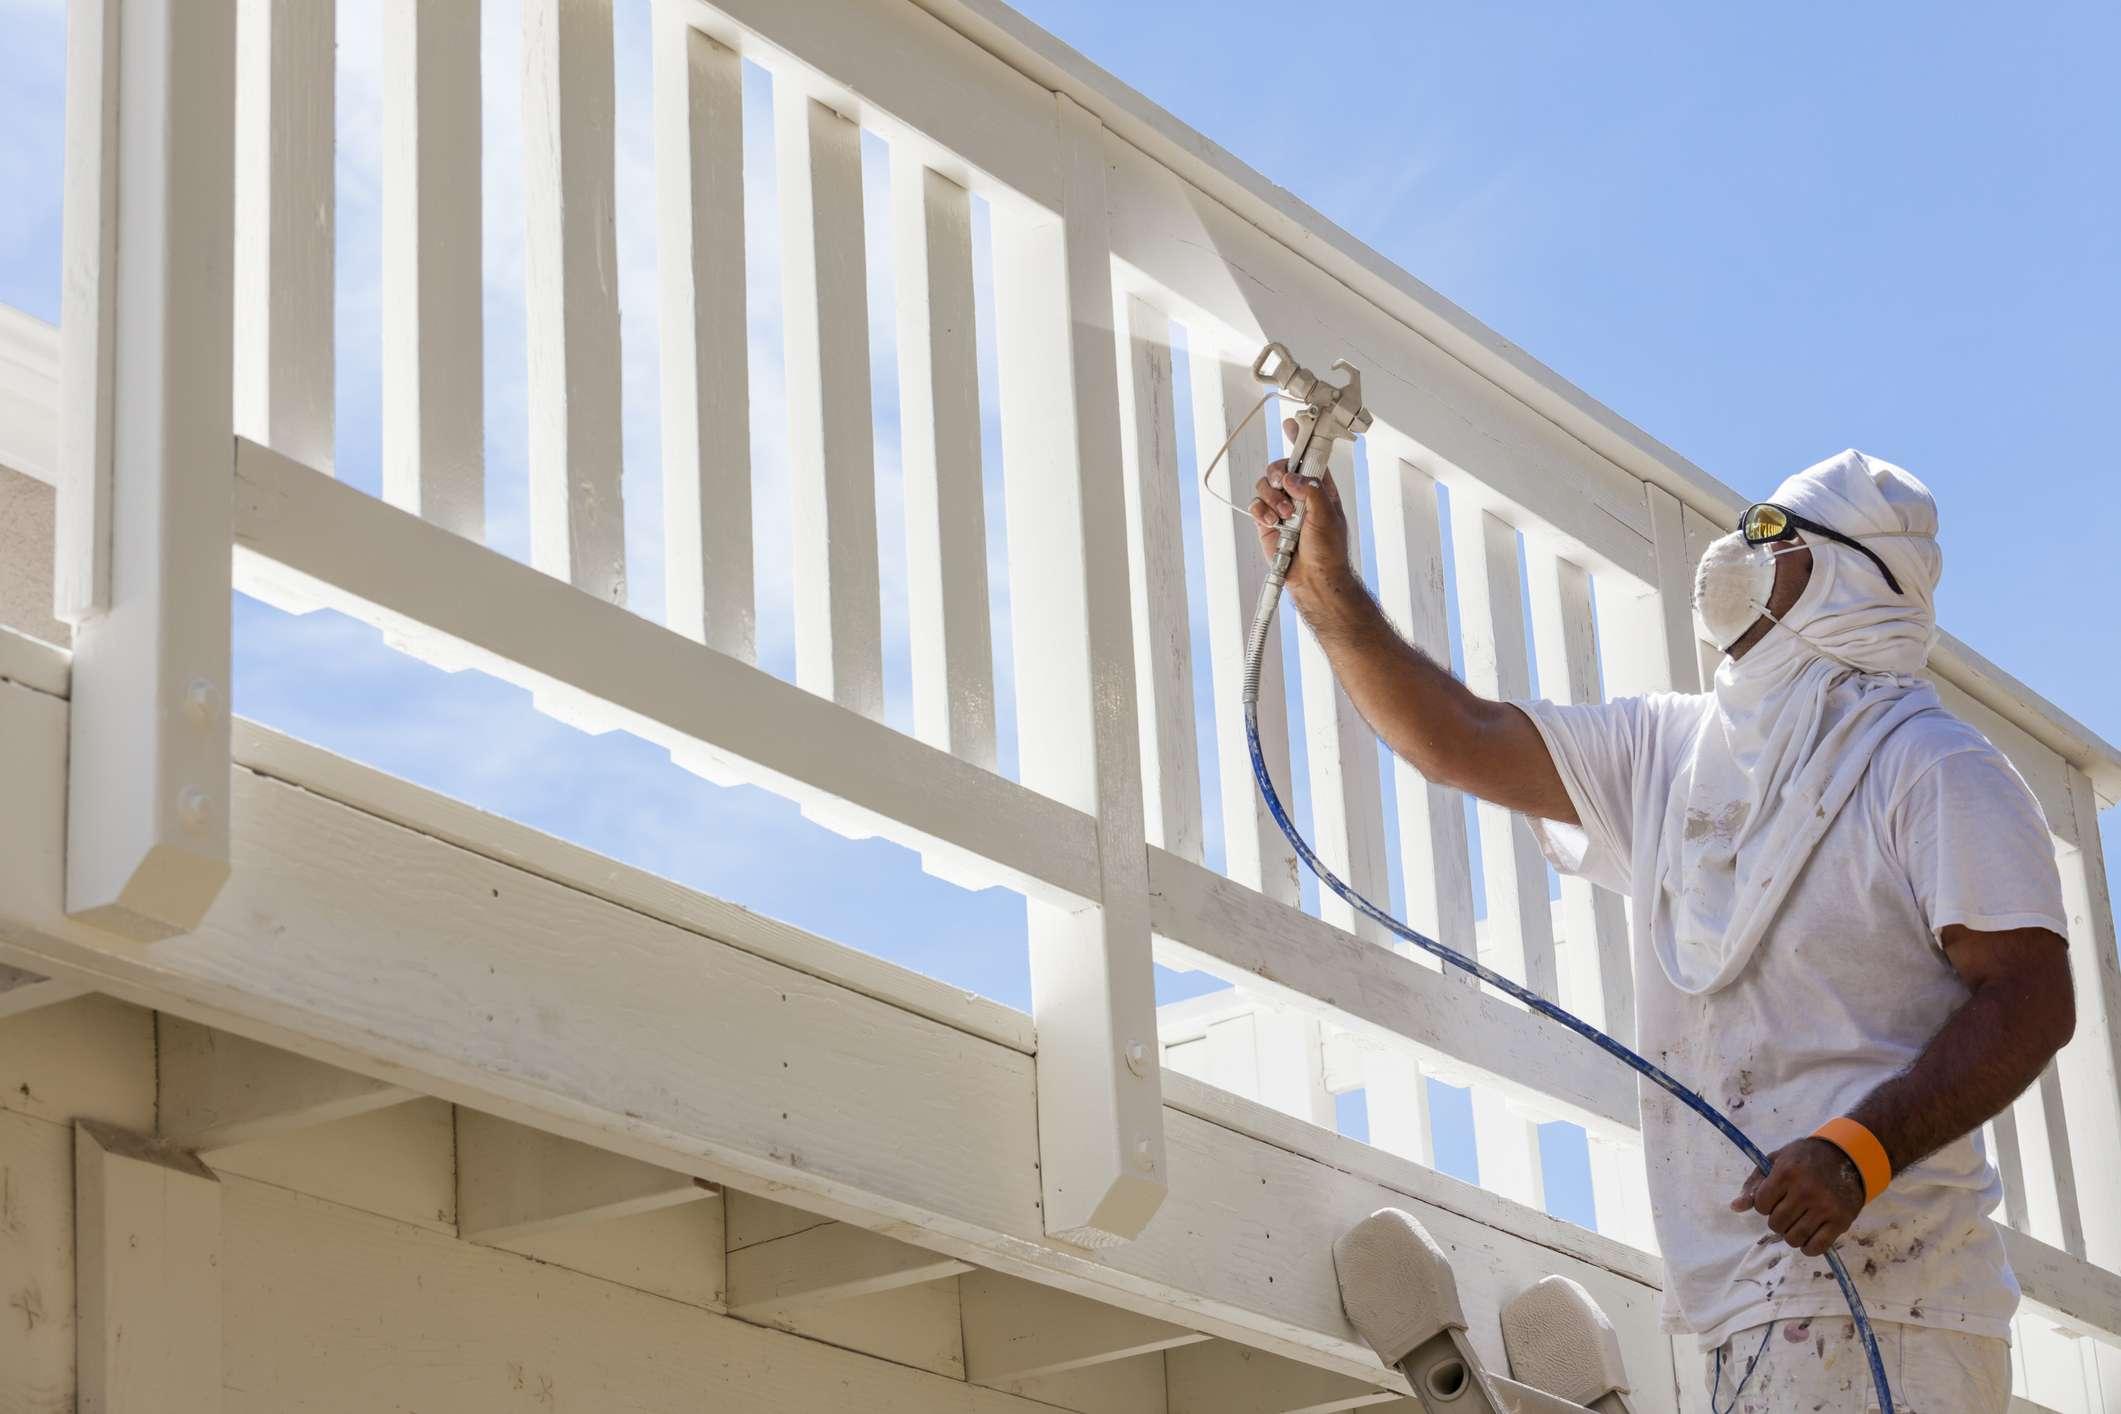 Spray painting home